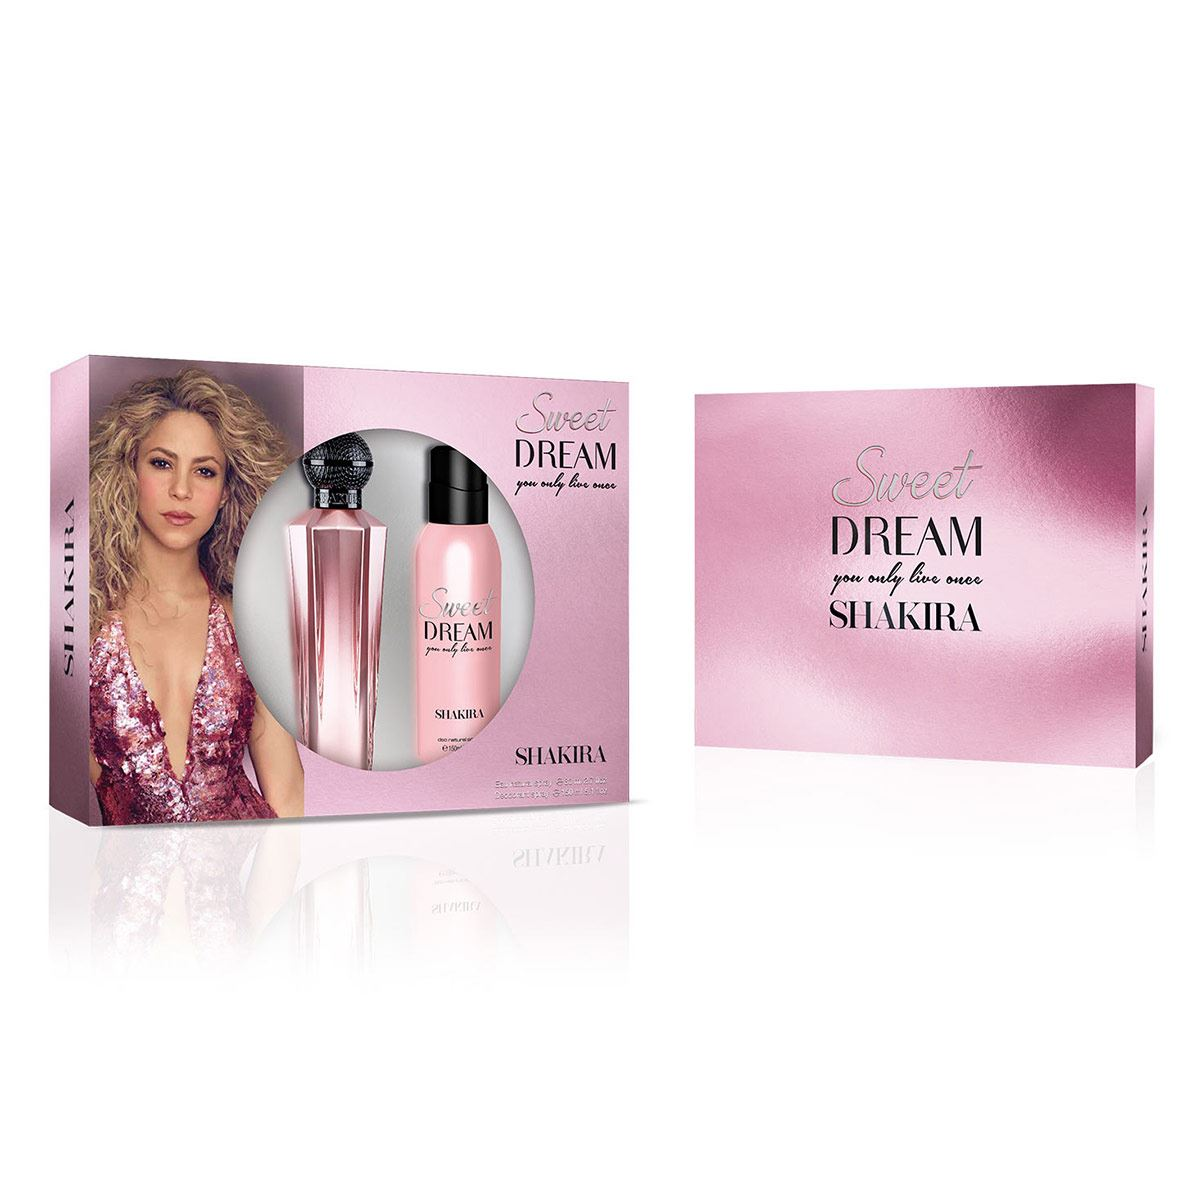 Set para dama, Shakira, Sweet ream, EDT 80 ml + Desodorante 150 ml